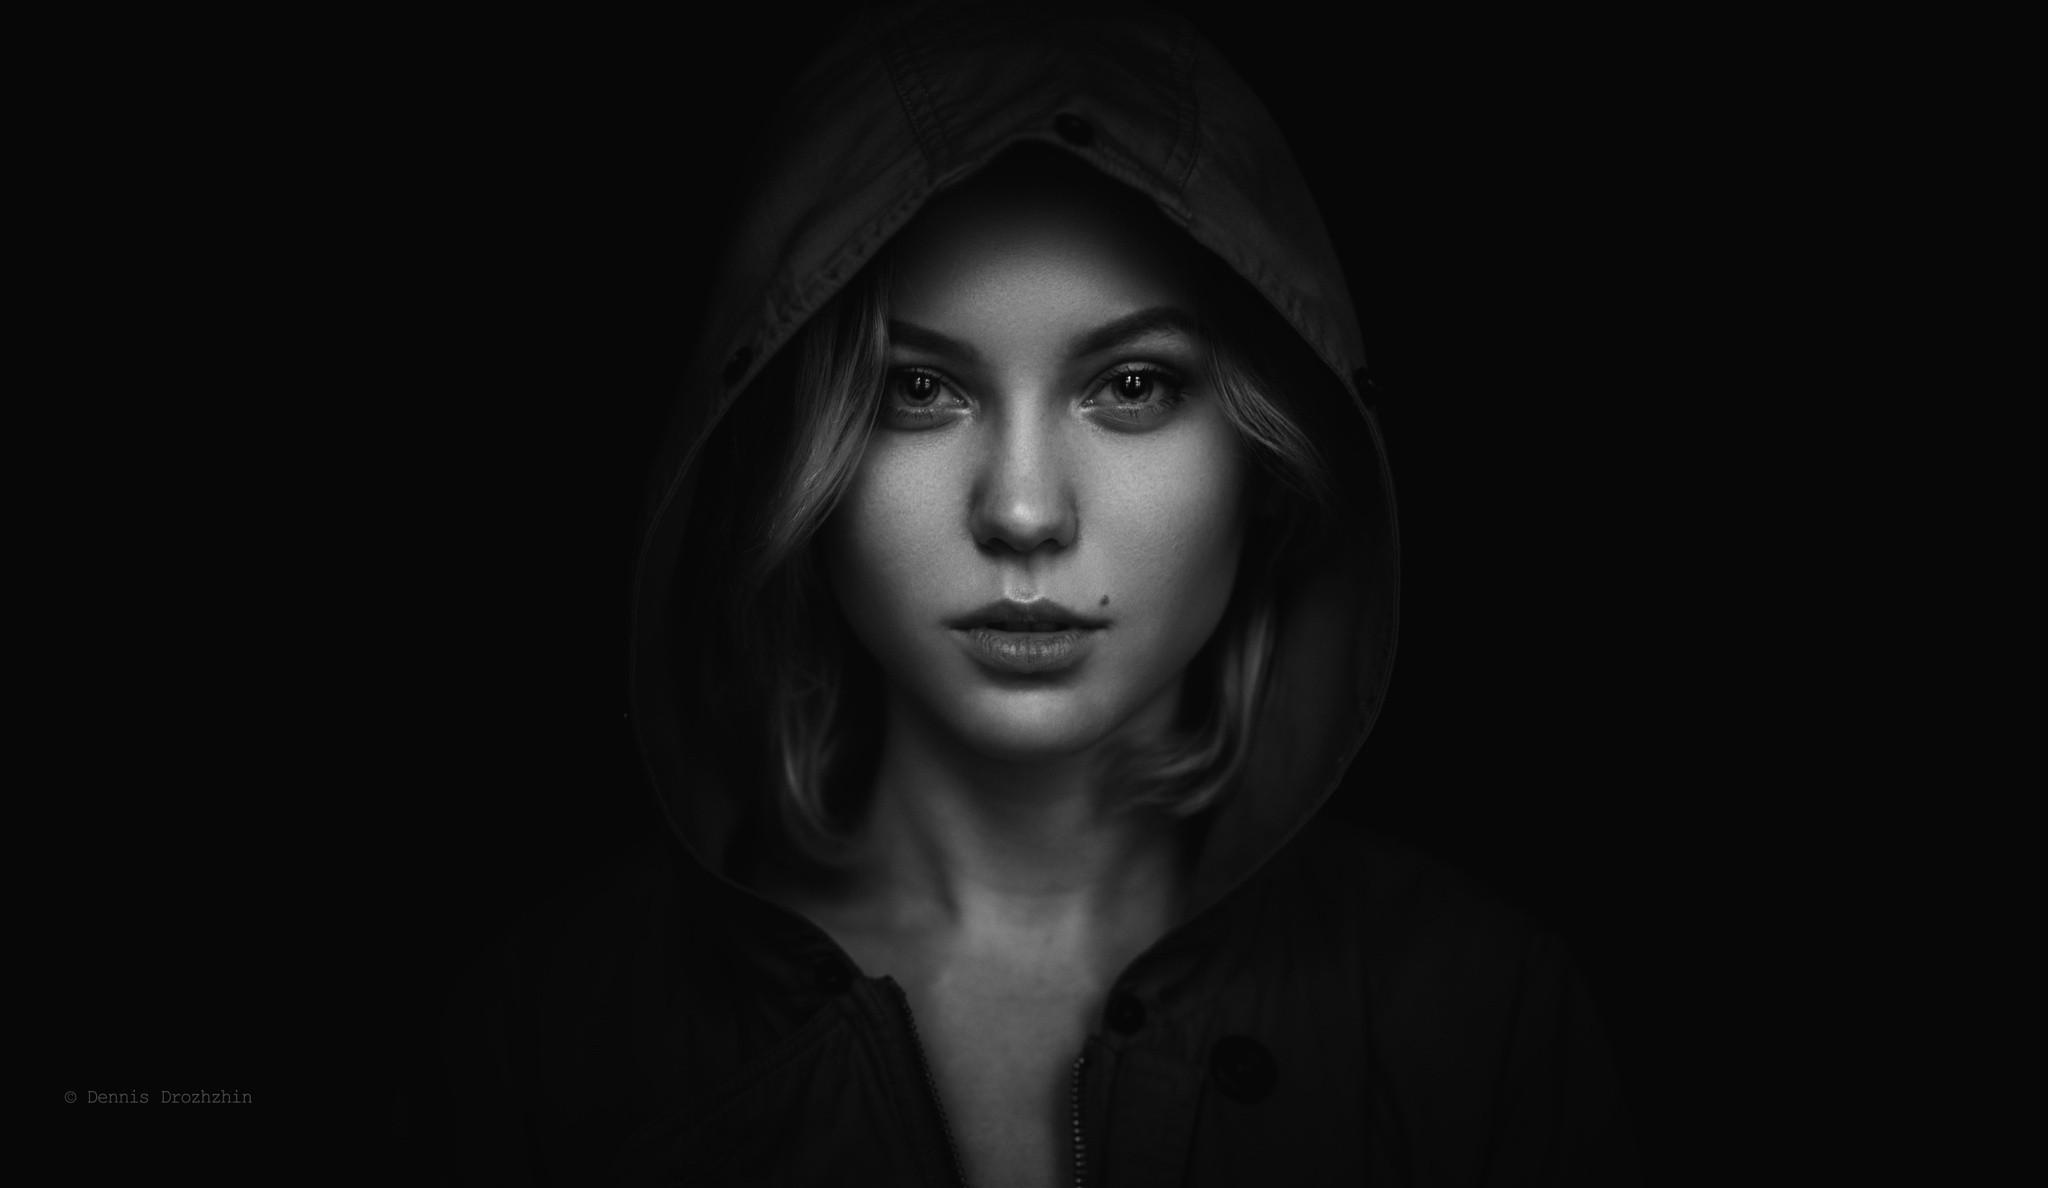 Porn black and white girl-5319